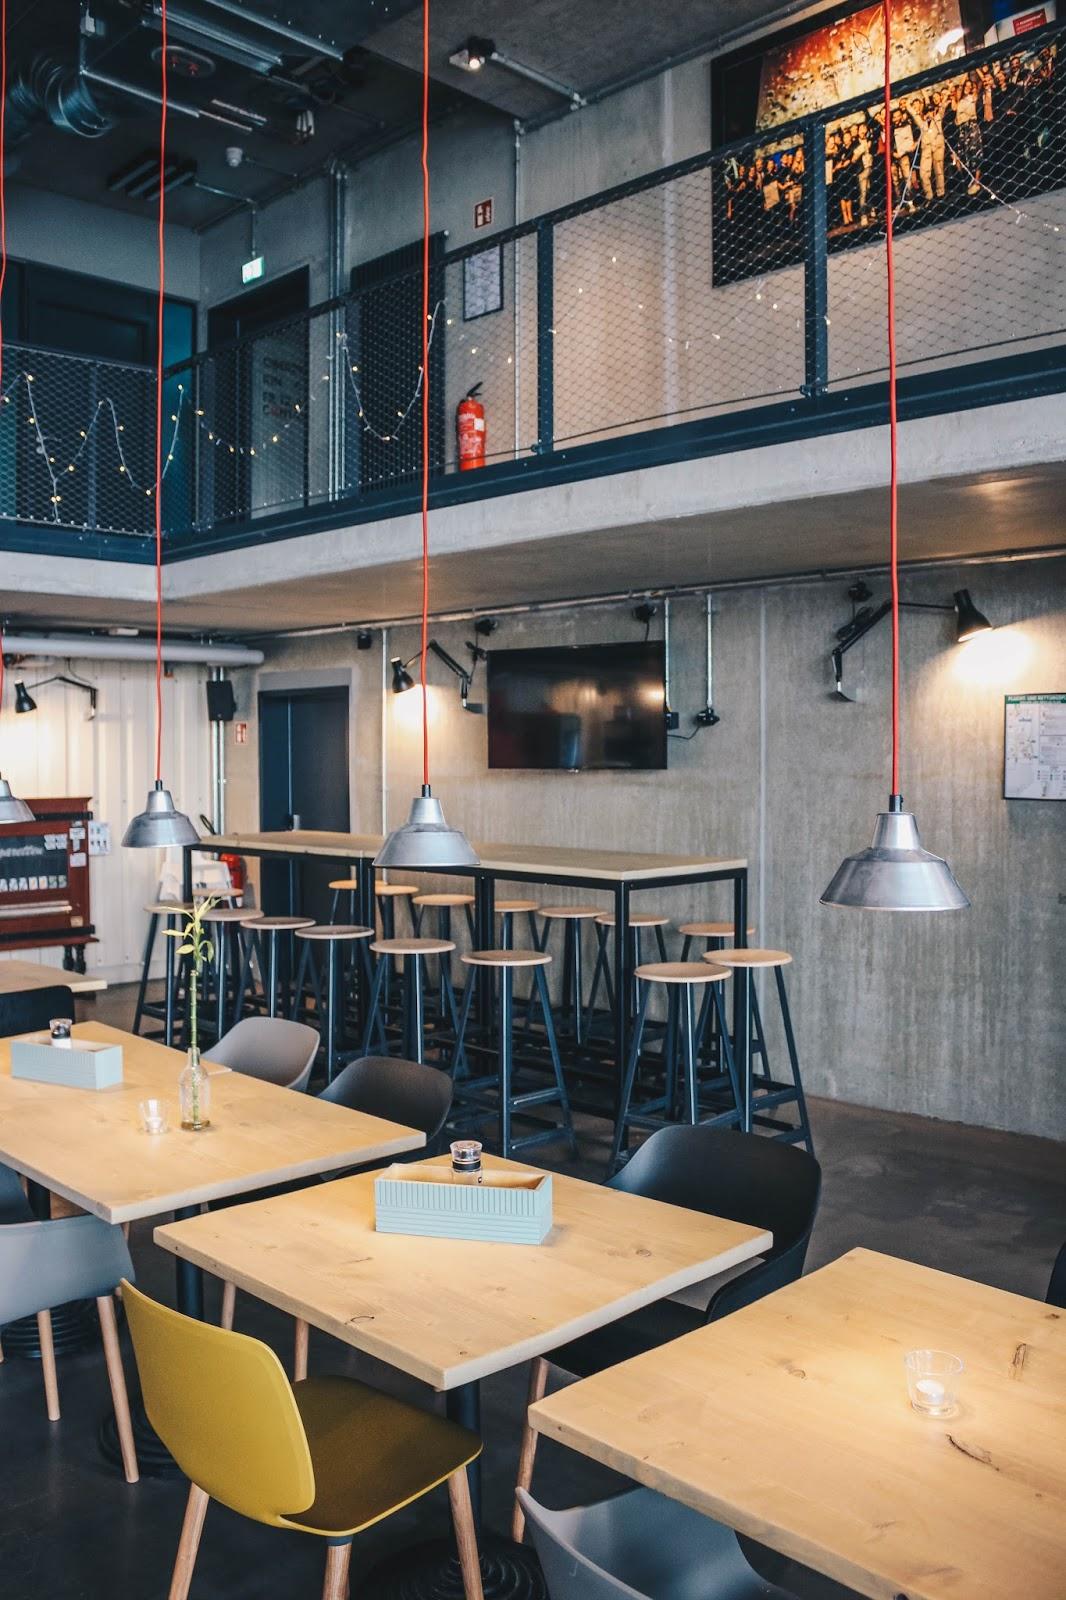 HOTEL - DOCK INN Hostel Warnemünde | Fashion Whisper | Bloglovin\'